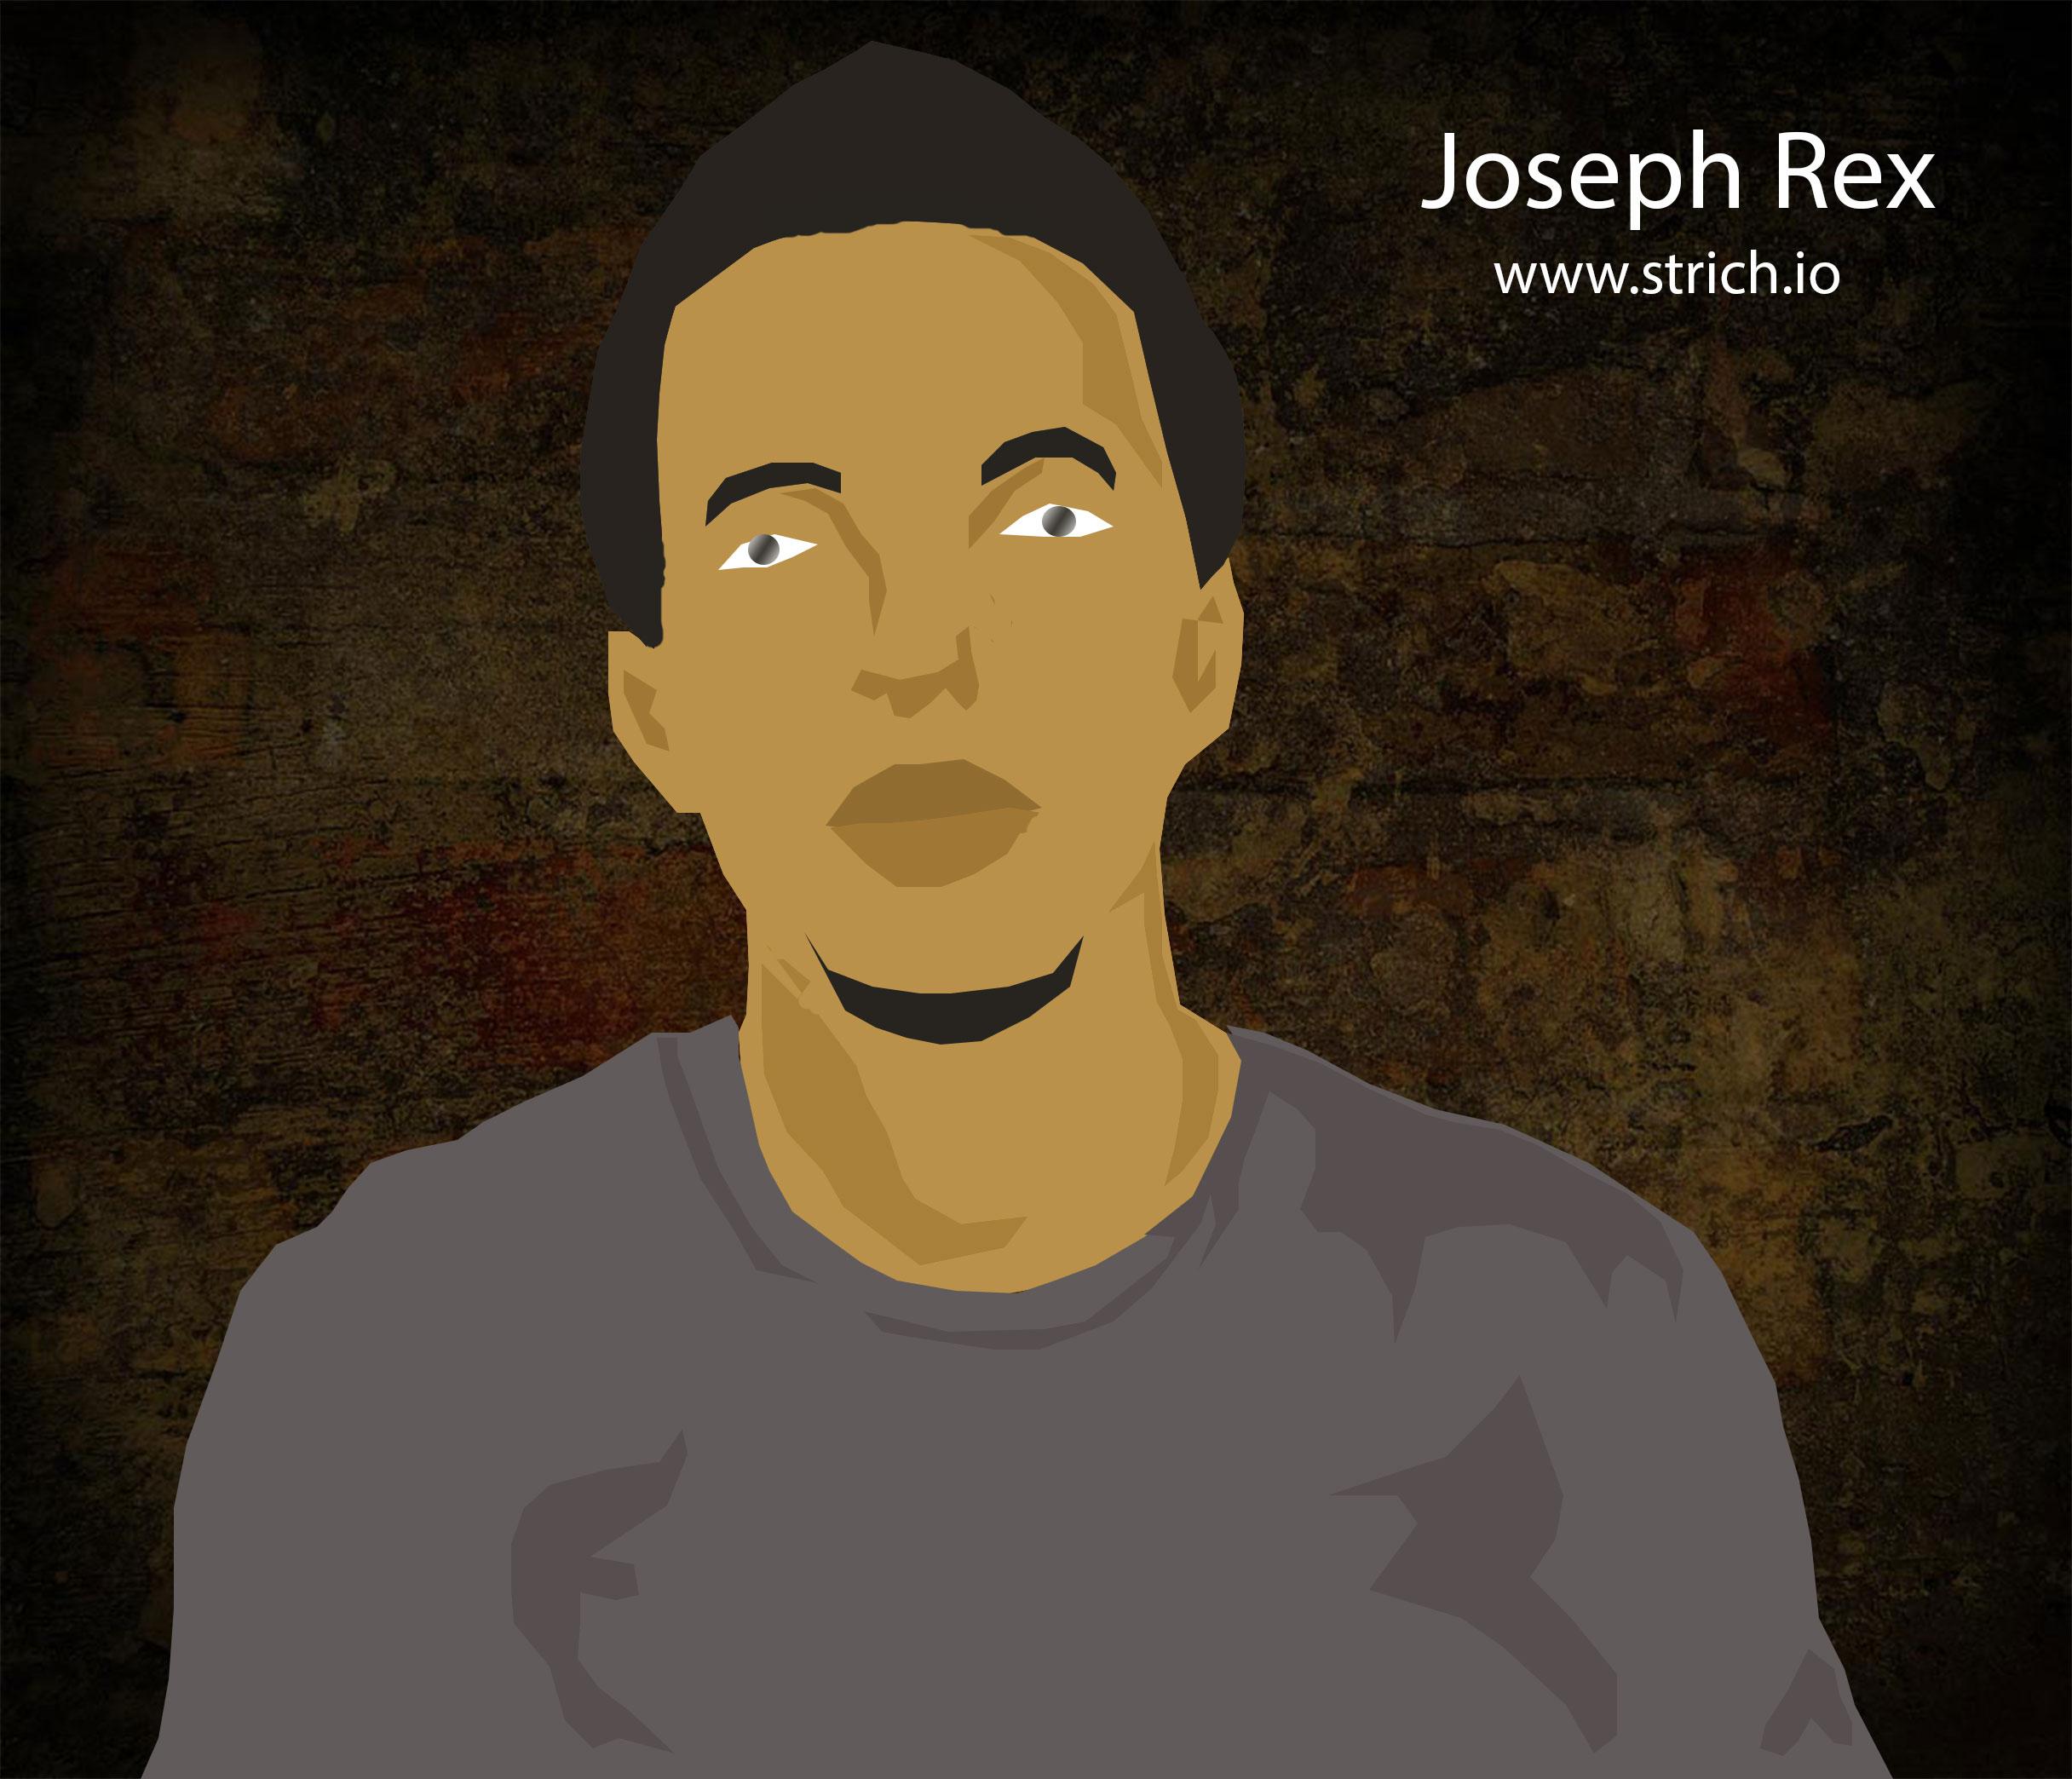 Joseph Rex